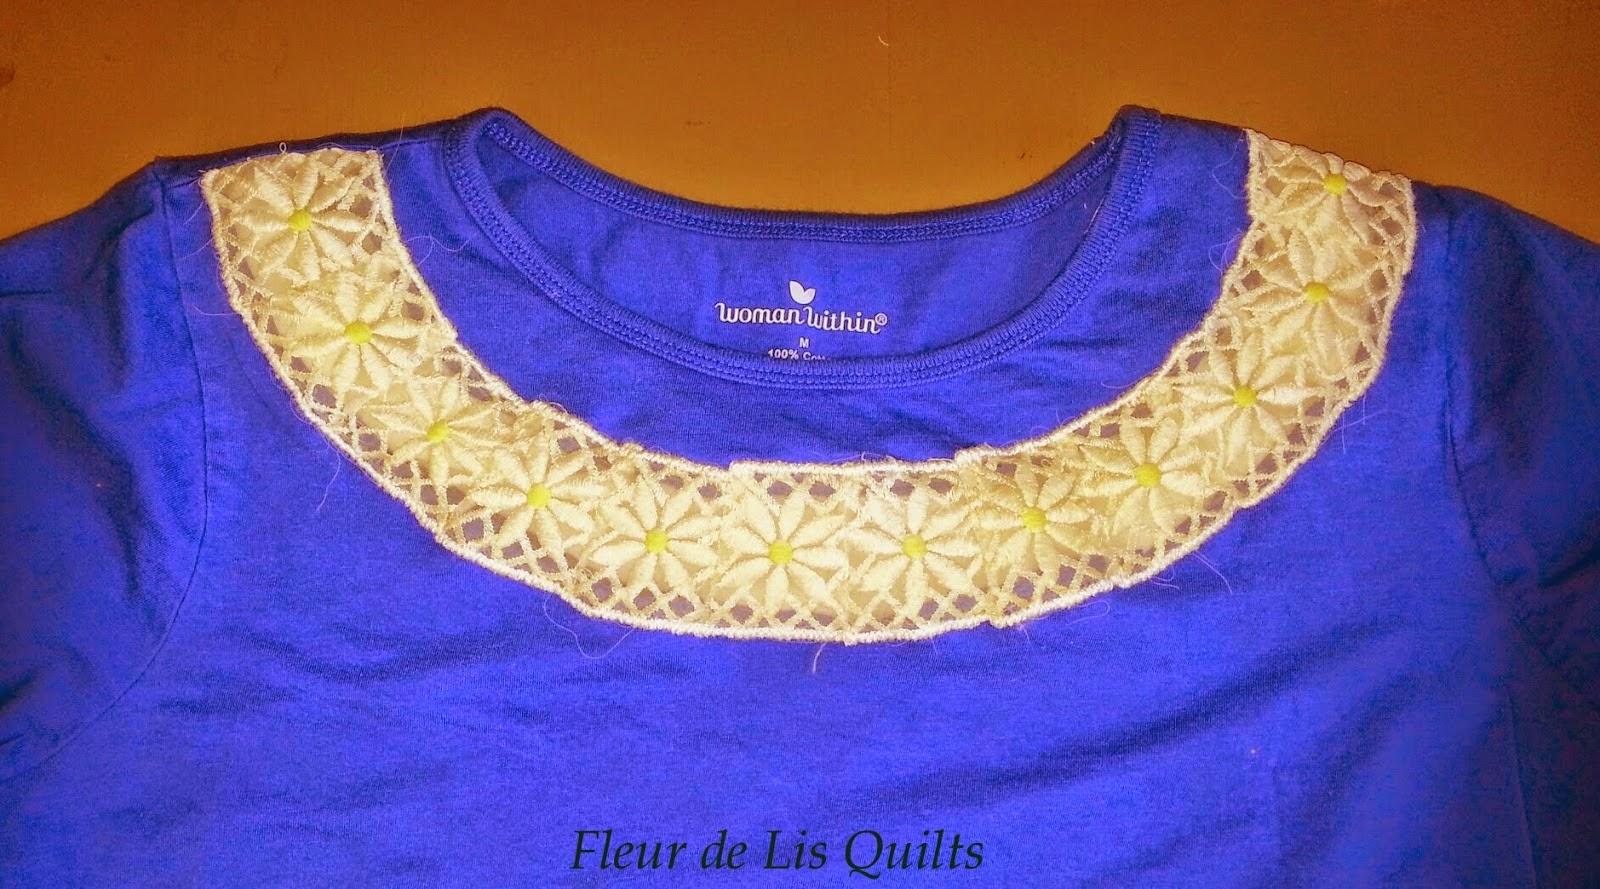 http://fleurdelisquilts.blogspot.com/2014/05/embellish-favorite-tee-with-vintage-lace.html